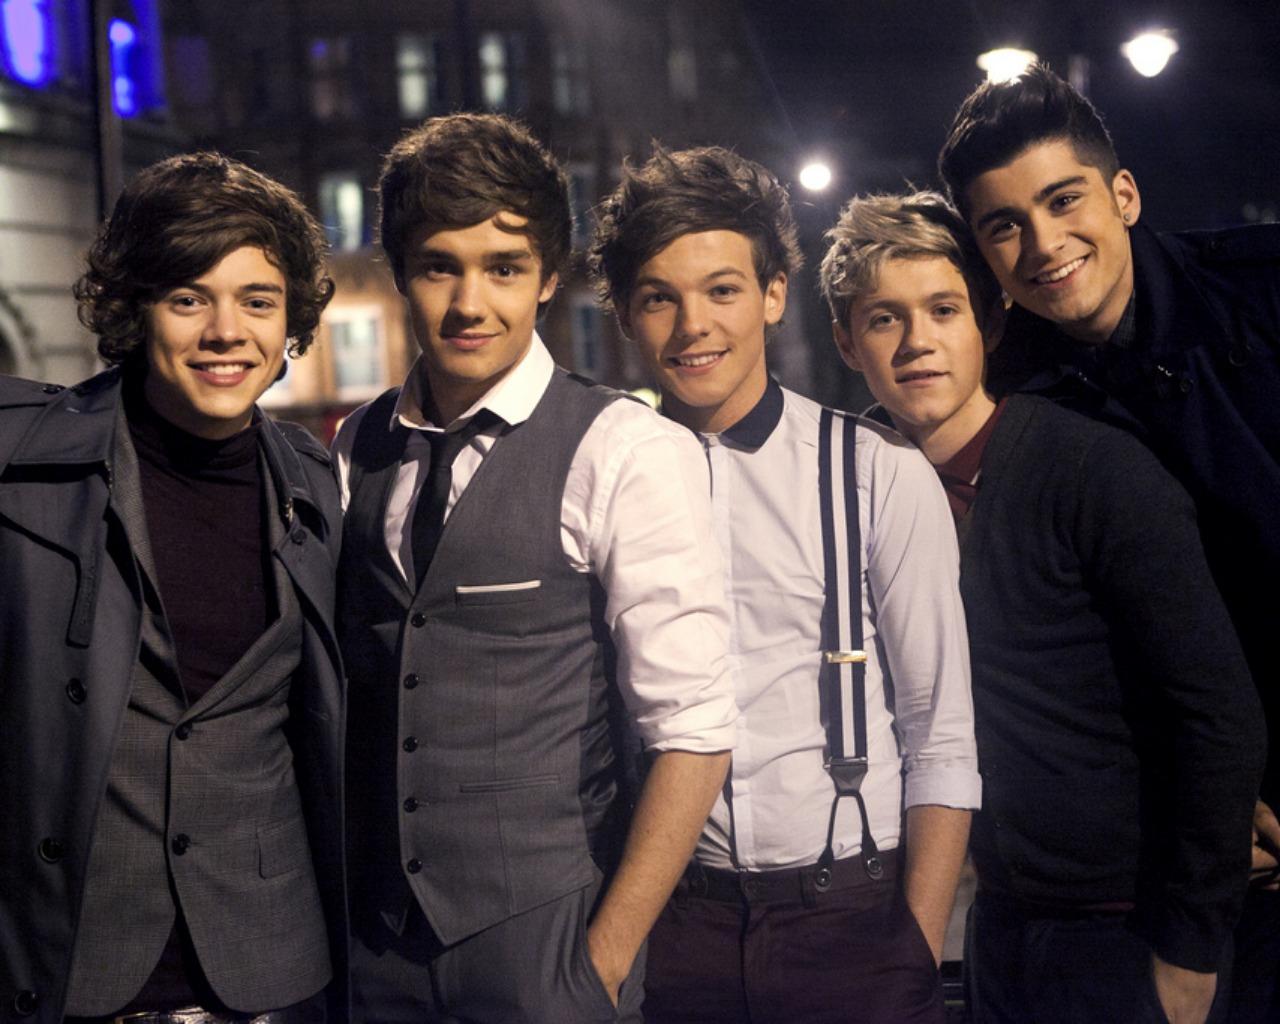 You And I One Direction Testo e Accordi Chords per Chitarra